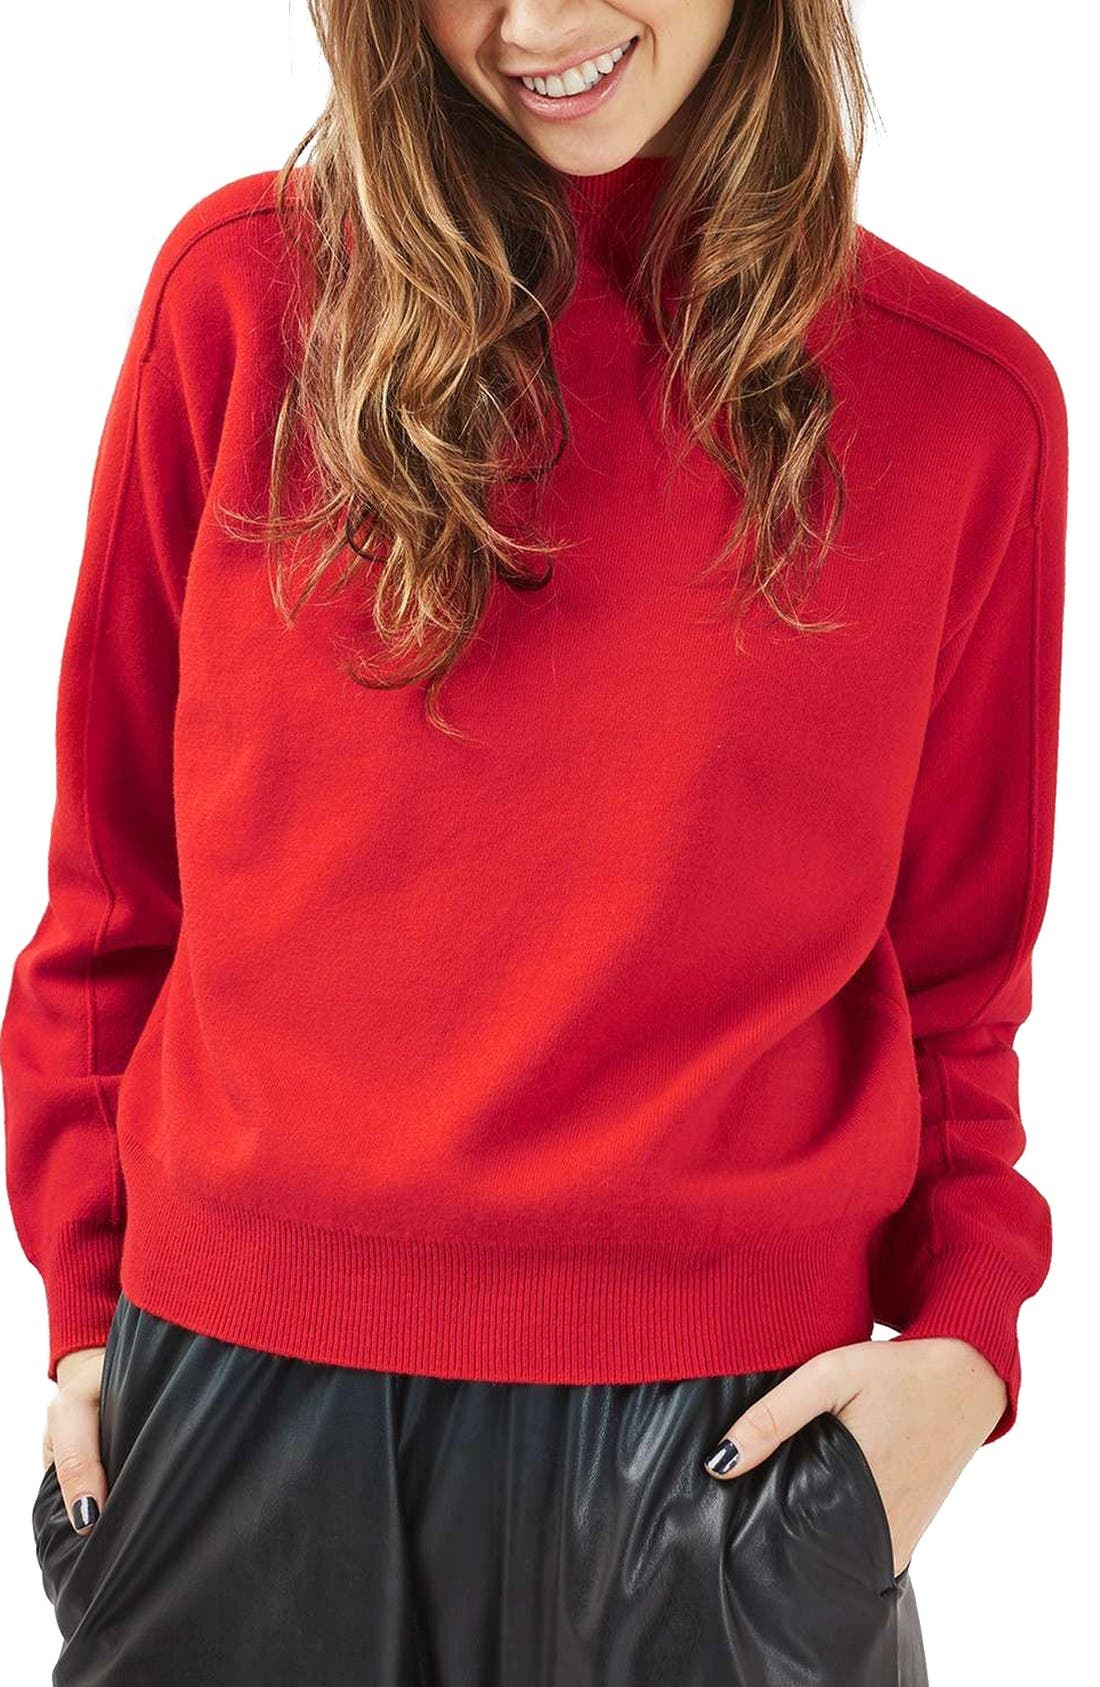 Alternate Image 1 Selected - Topshop Mock Neck Sweater